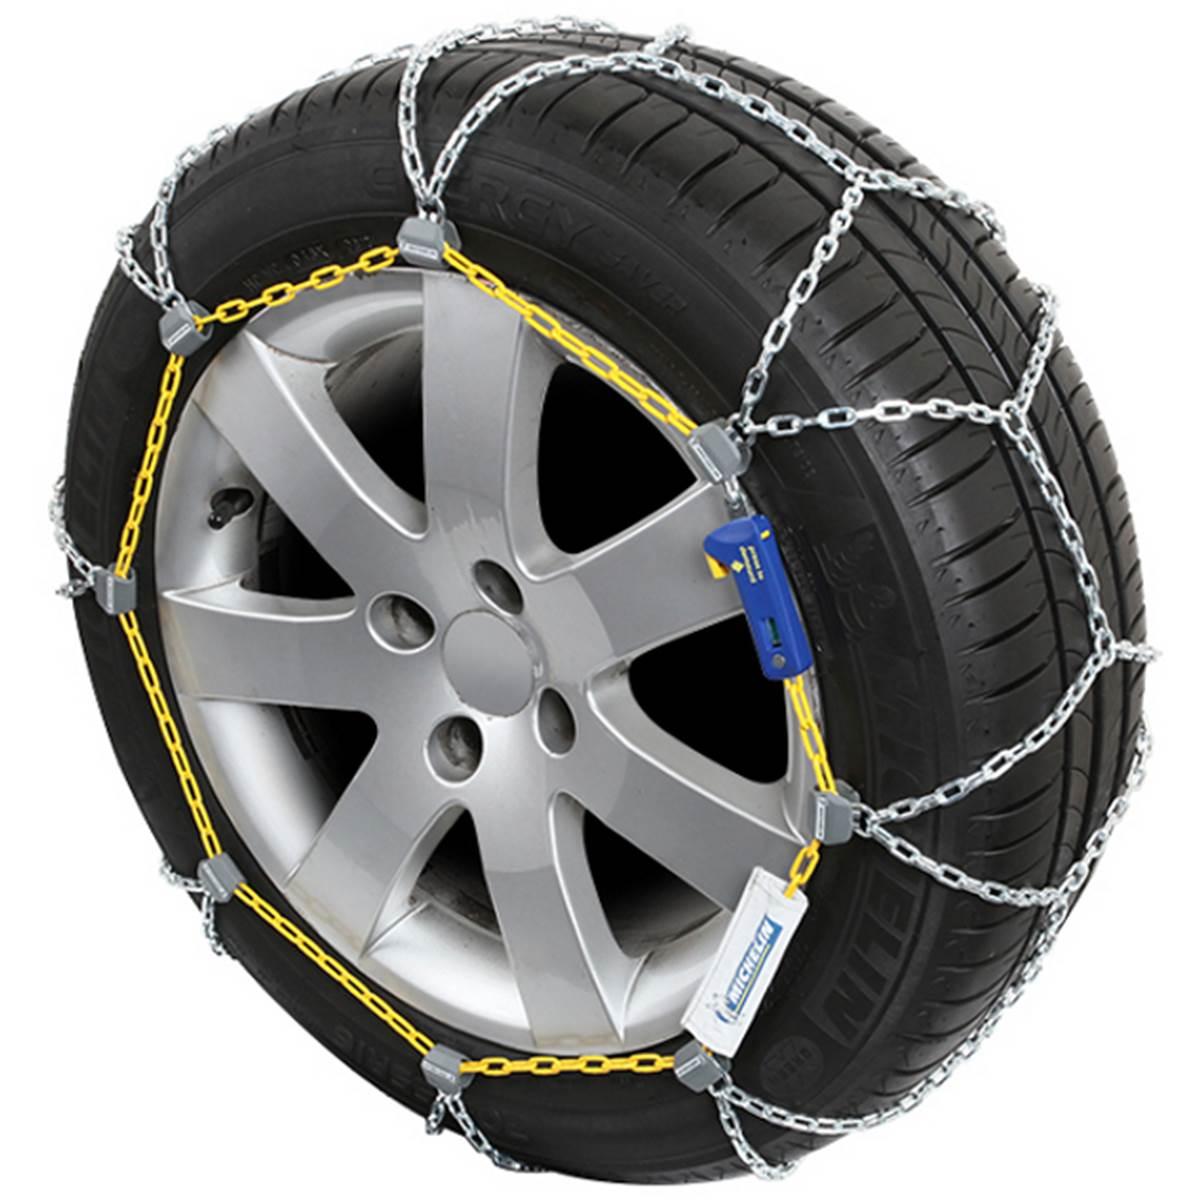 2 Chaînes neige Michelin elastic Chain MI40